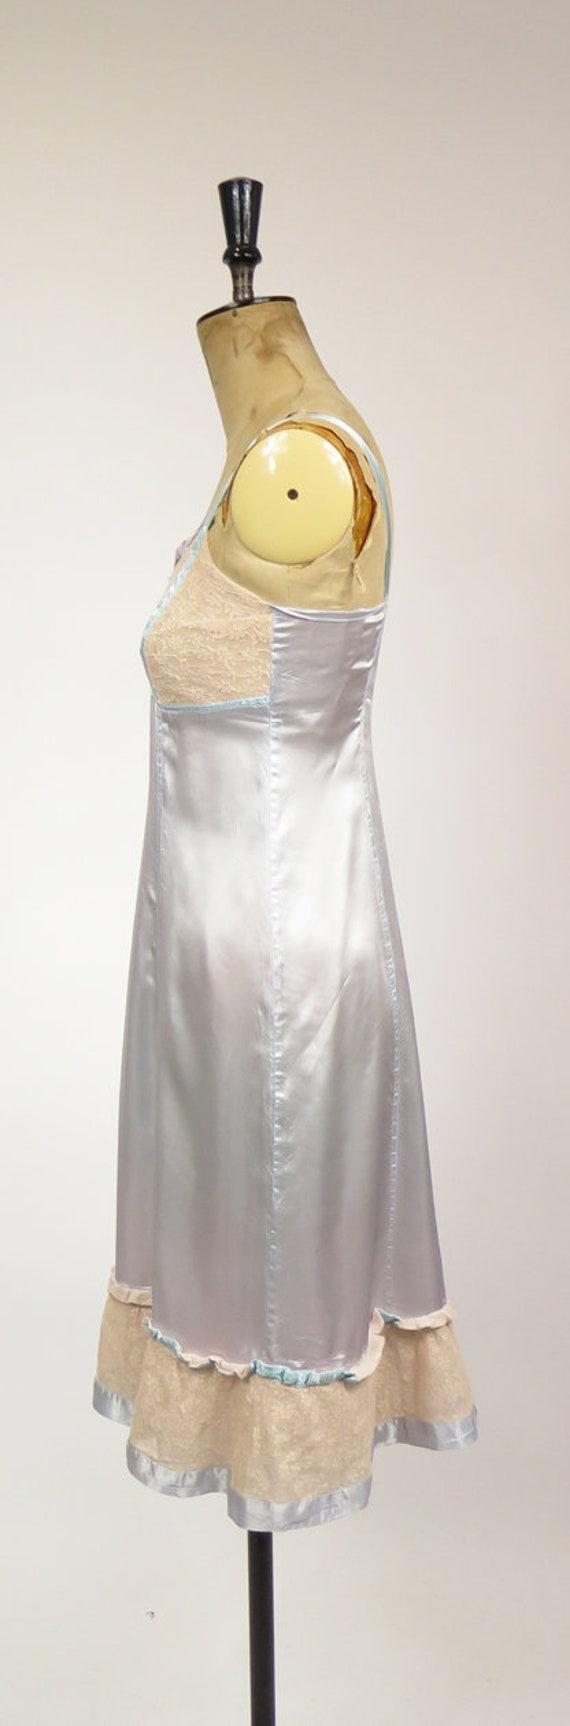 Original Vintage 1940-50s Dusky Blue Nude Lace Sl… - image 3